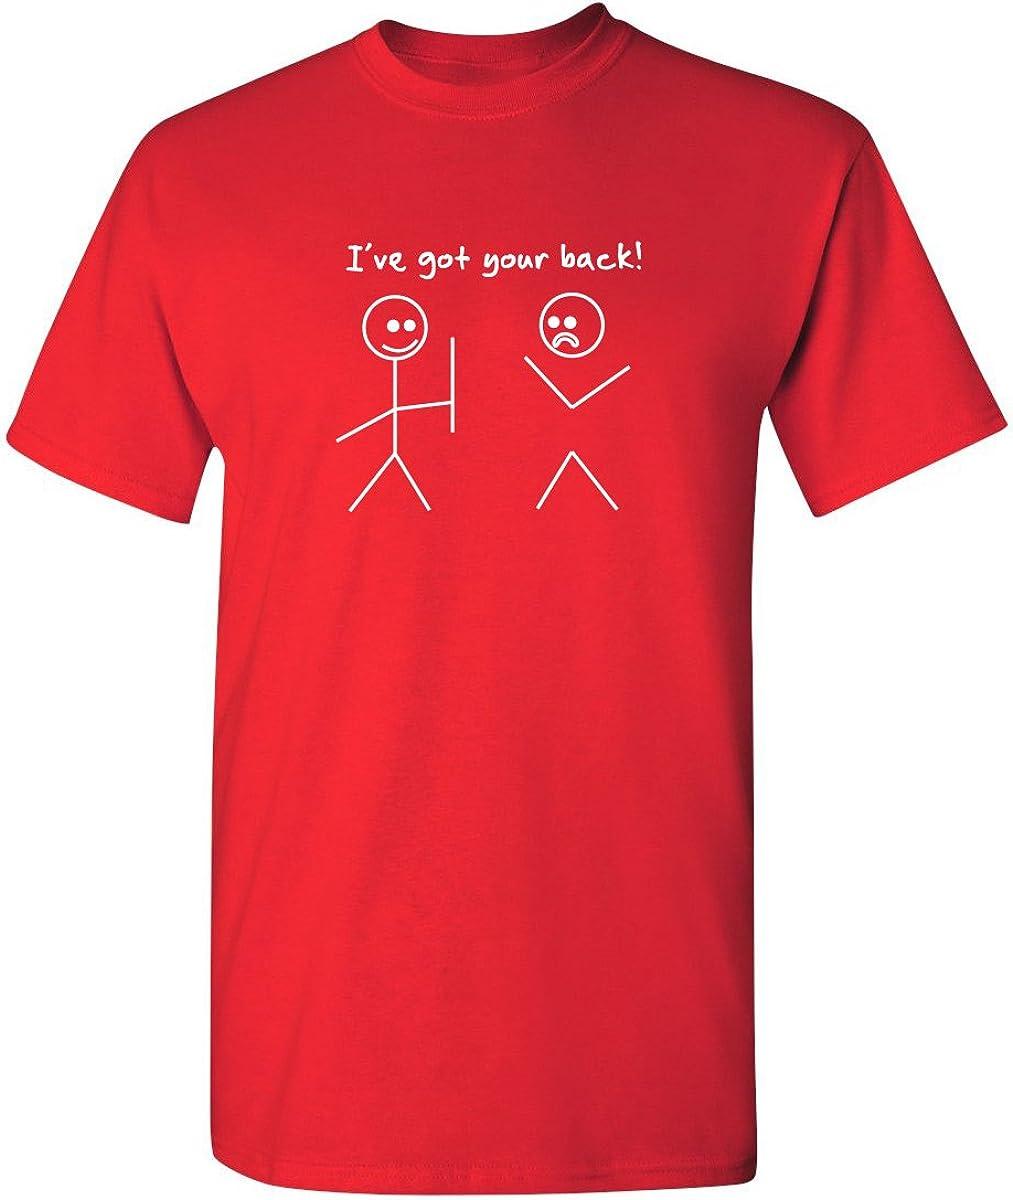 I Got Your Back Stick Figure Friendship Novelty Sarcasm Teens Funny T Shirt